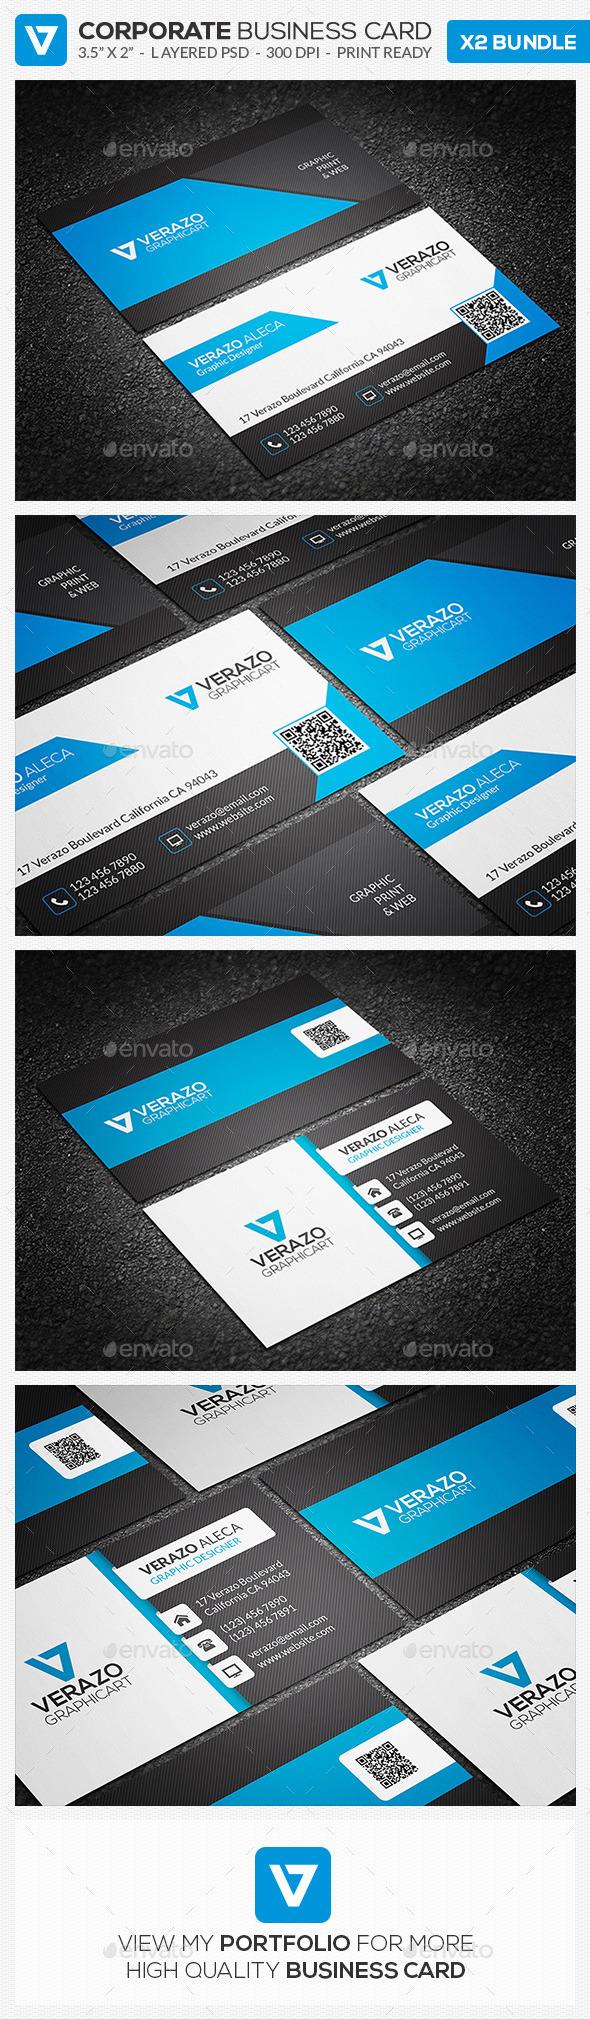 GraphicRiver Business Card Bundle 17 11000899